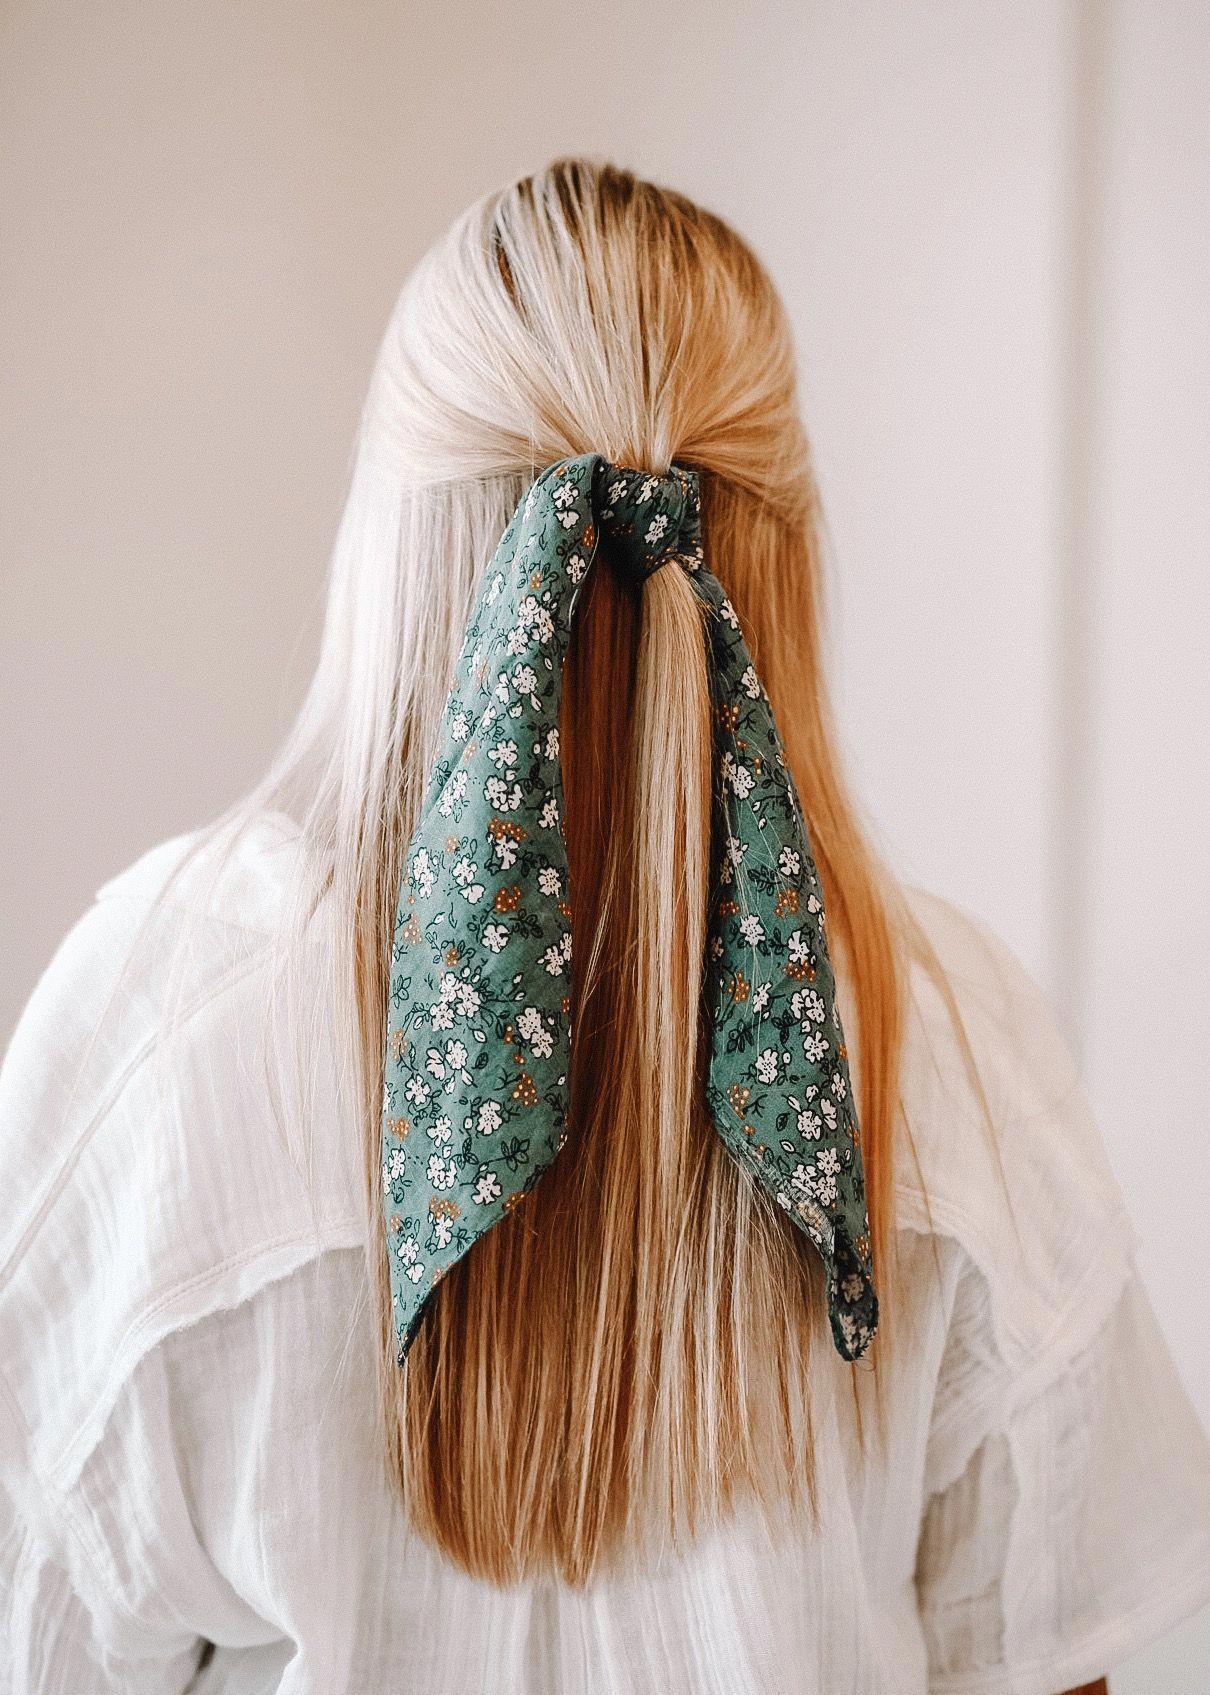 Bandana Scarf Teal Floral James Alma Clothing Longhairstyles Hair Styles Headband Hairstyles Scarf Hairstyles